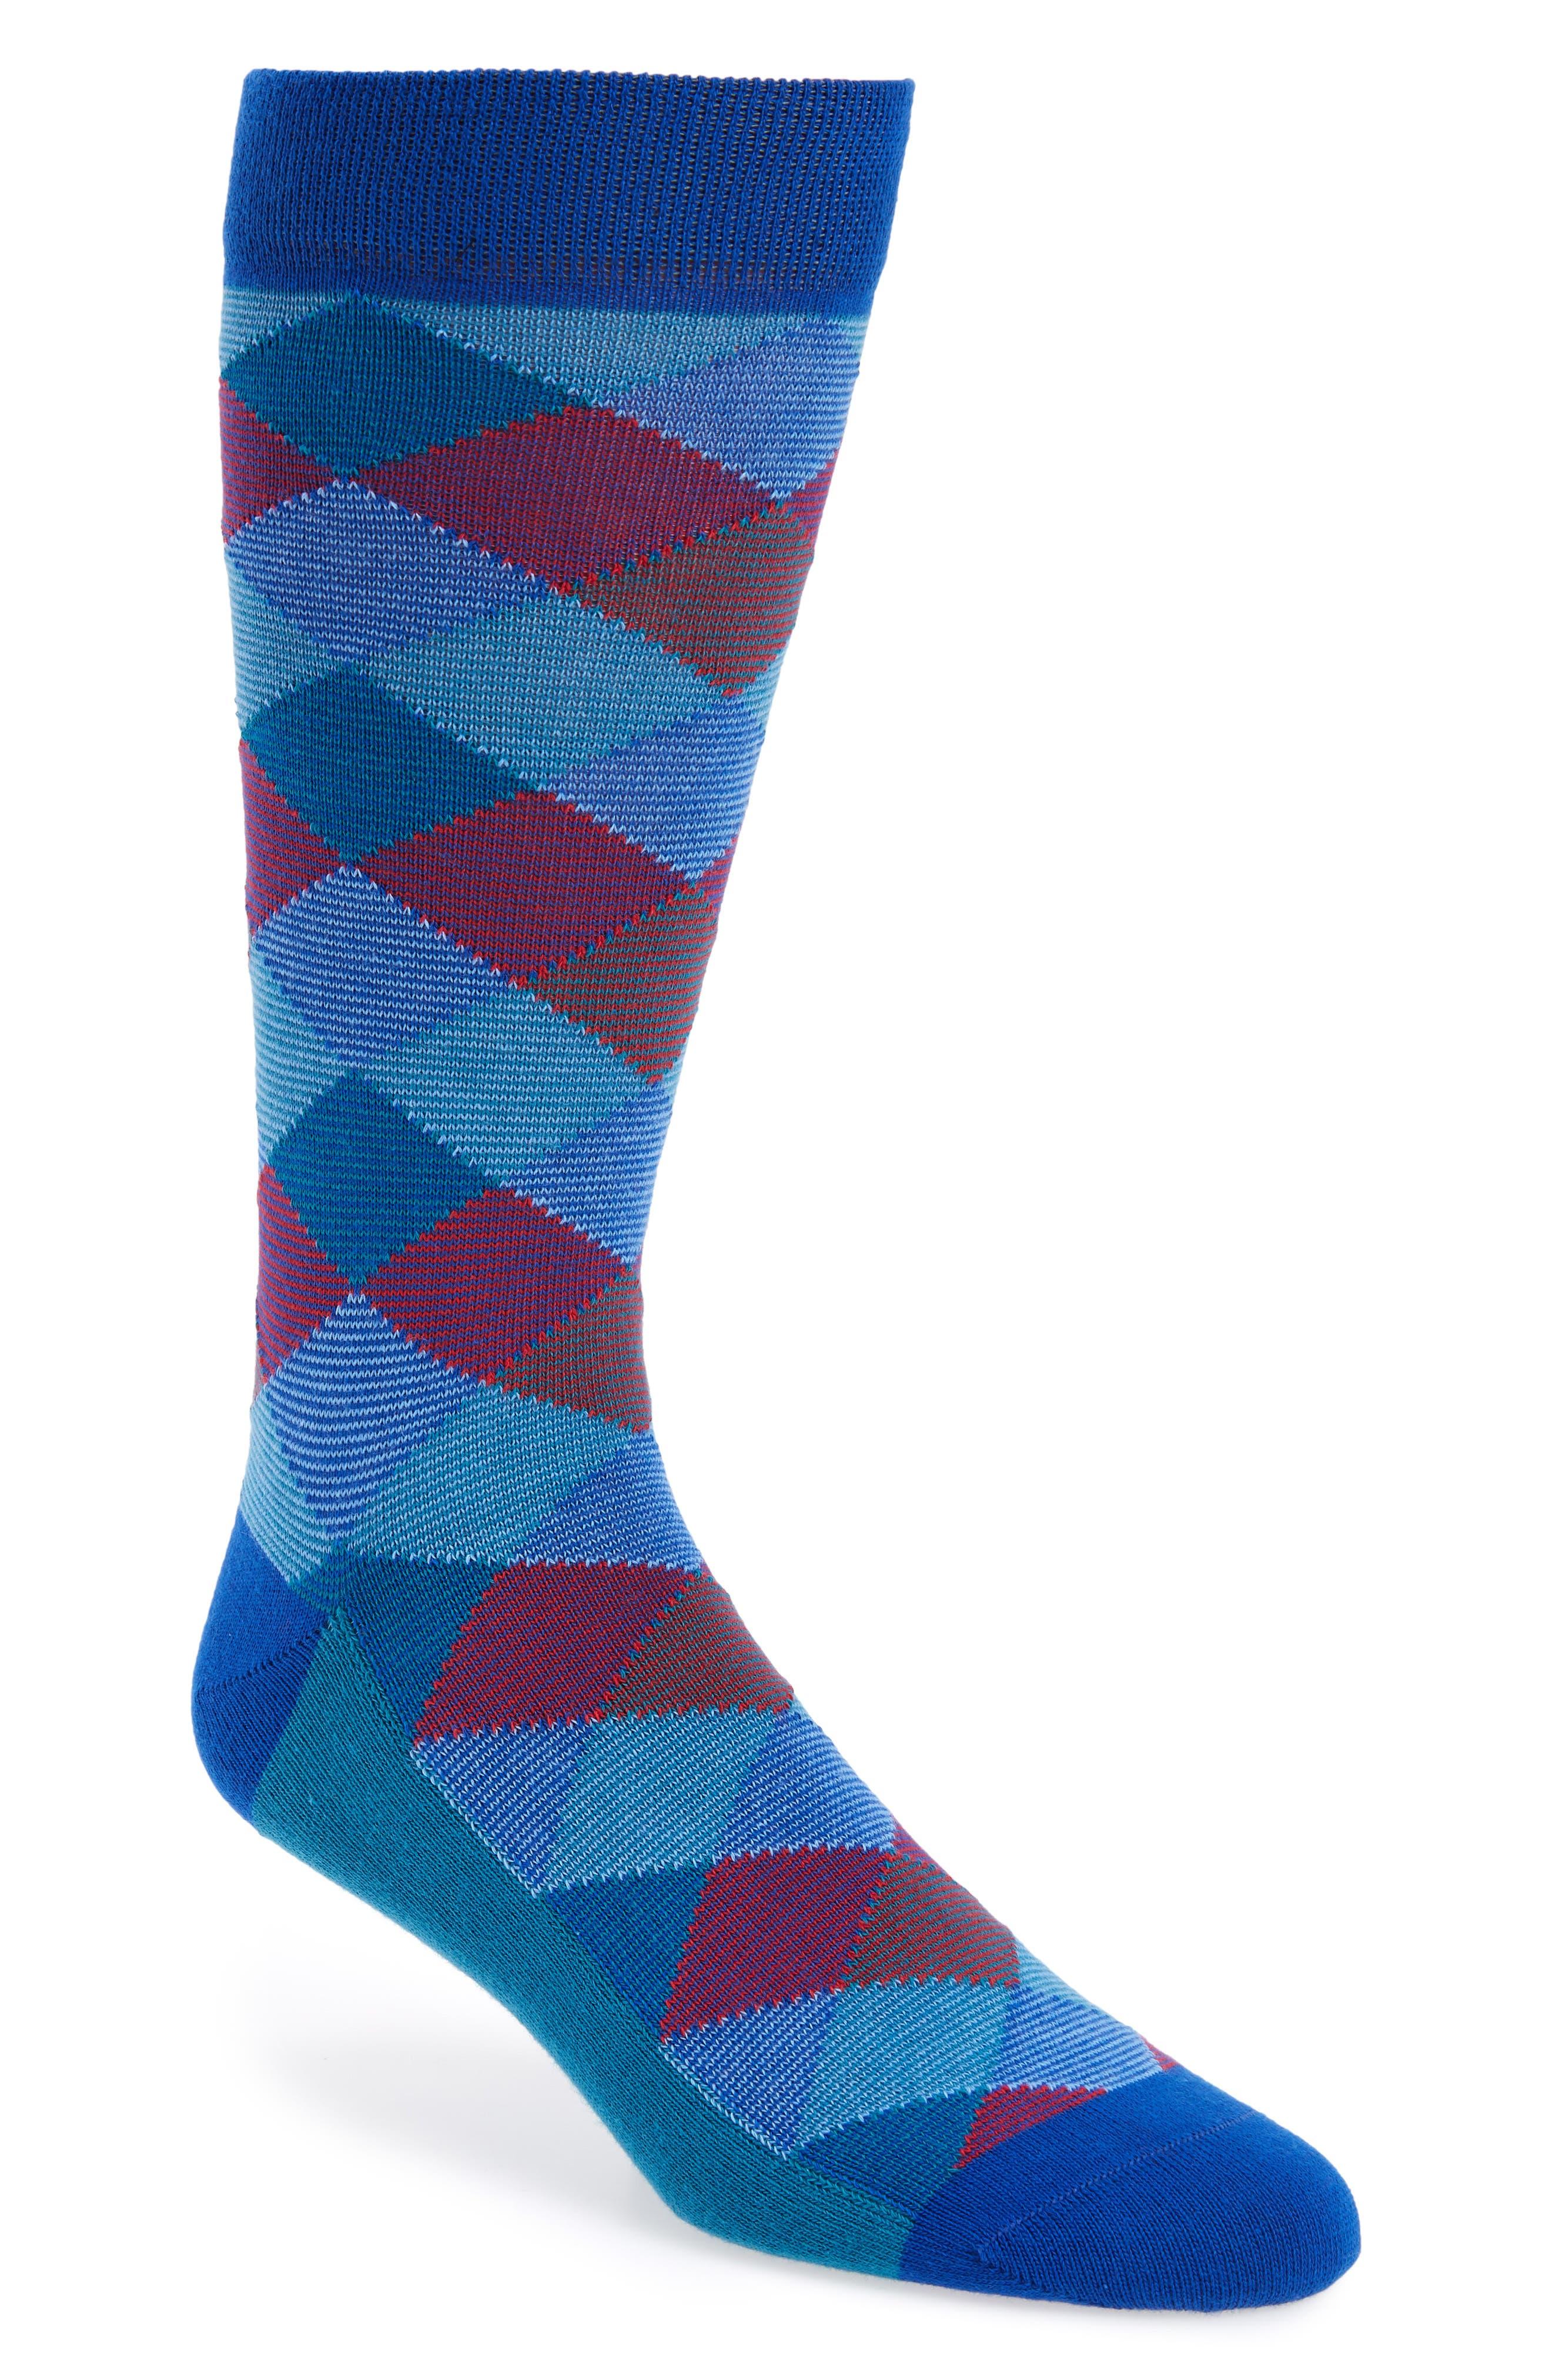 Shiftie Argyle Socks,                             Main thumbnail 1, color,                             421